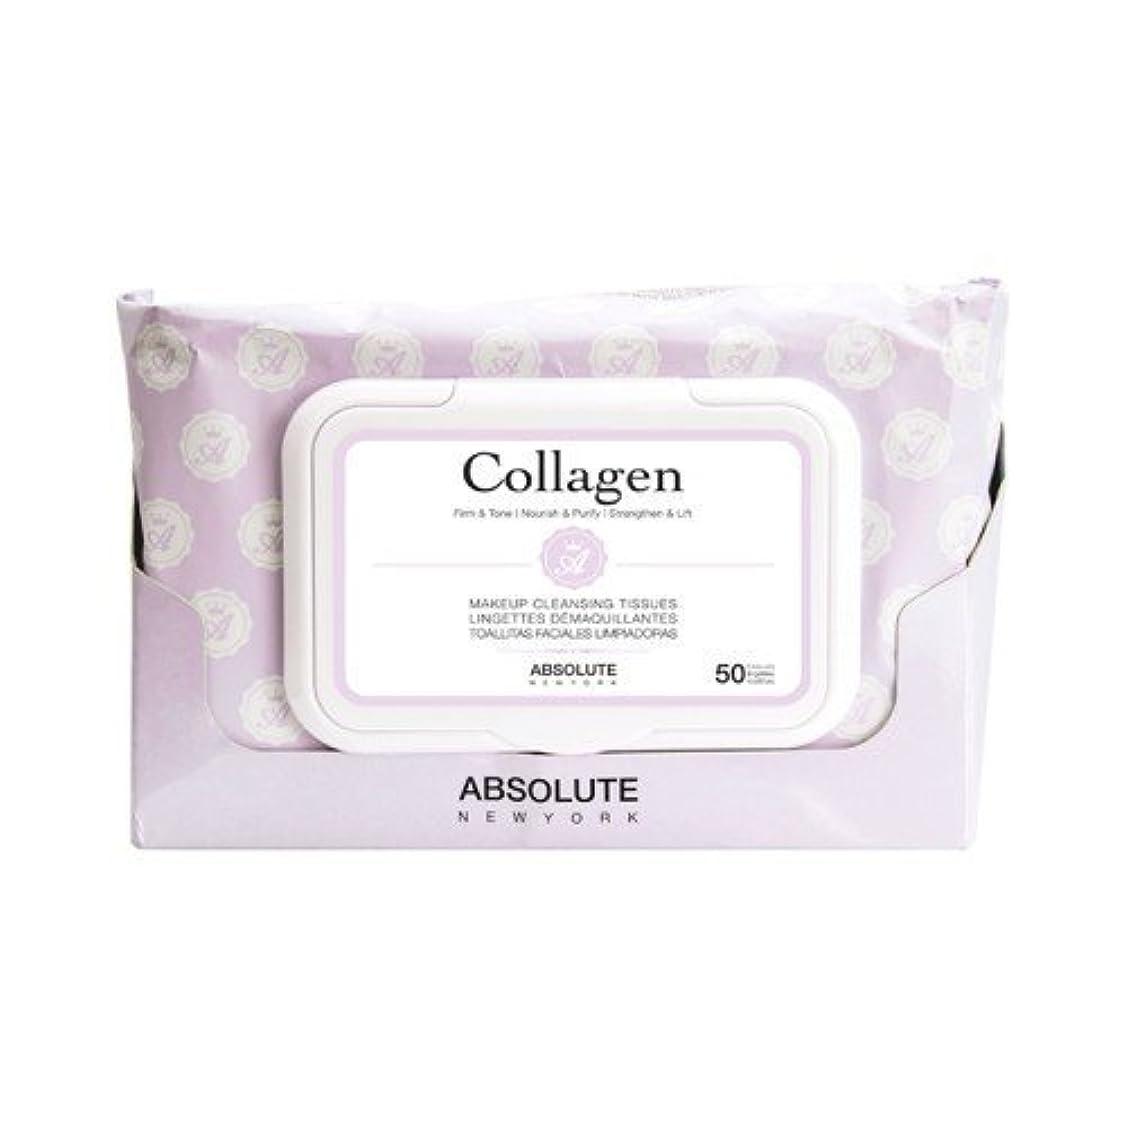 思春期本気副産物ABSOLUTE Makeup Cleansing Tissue 50CT - Collagen (並行輸入品)